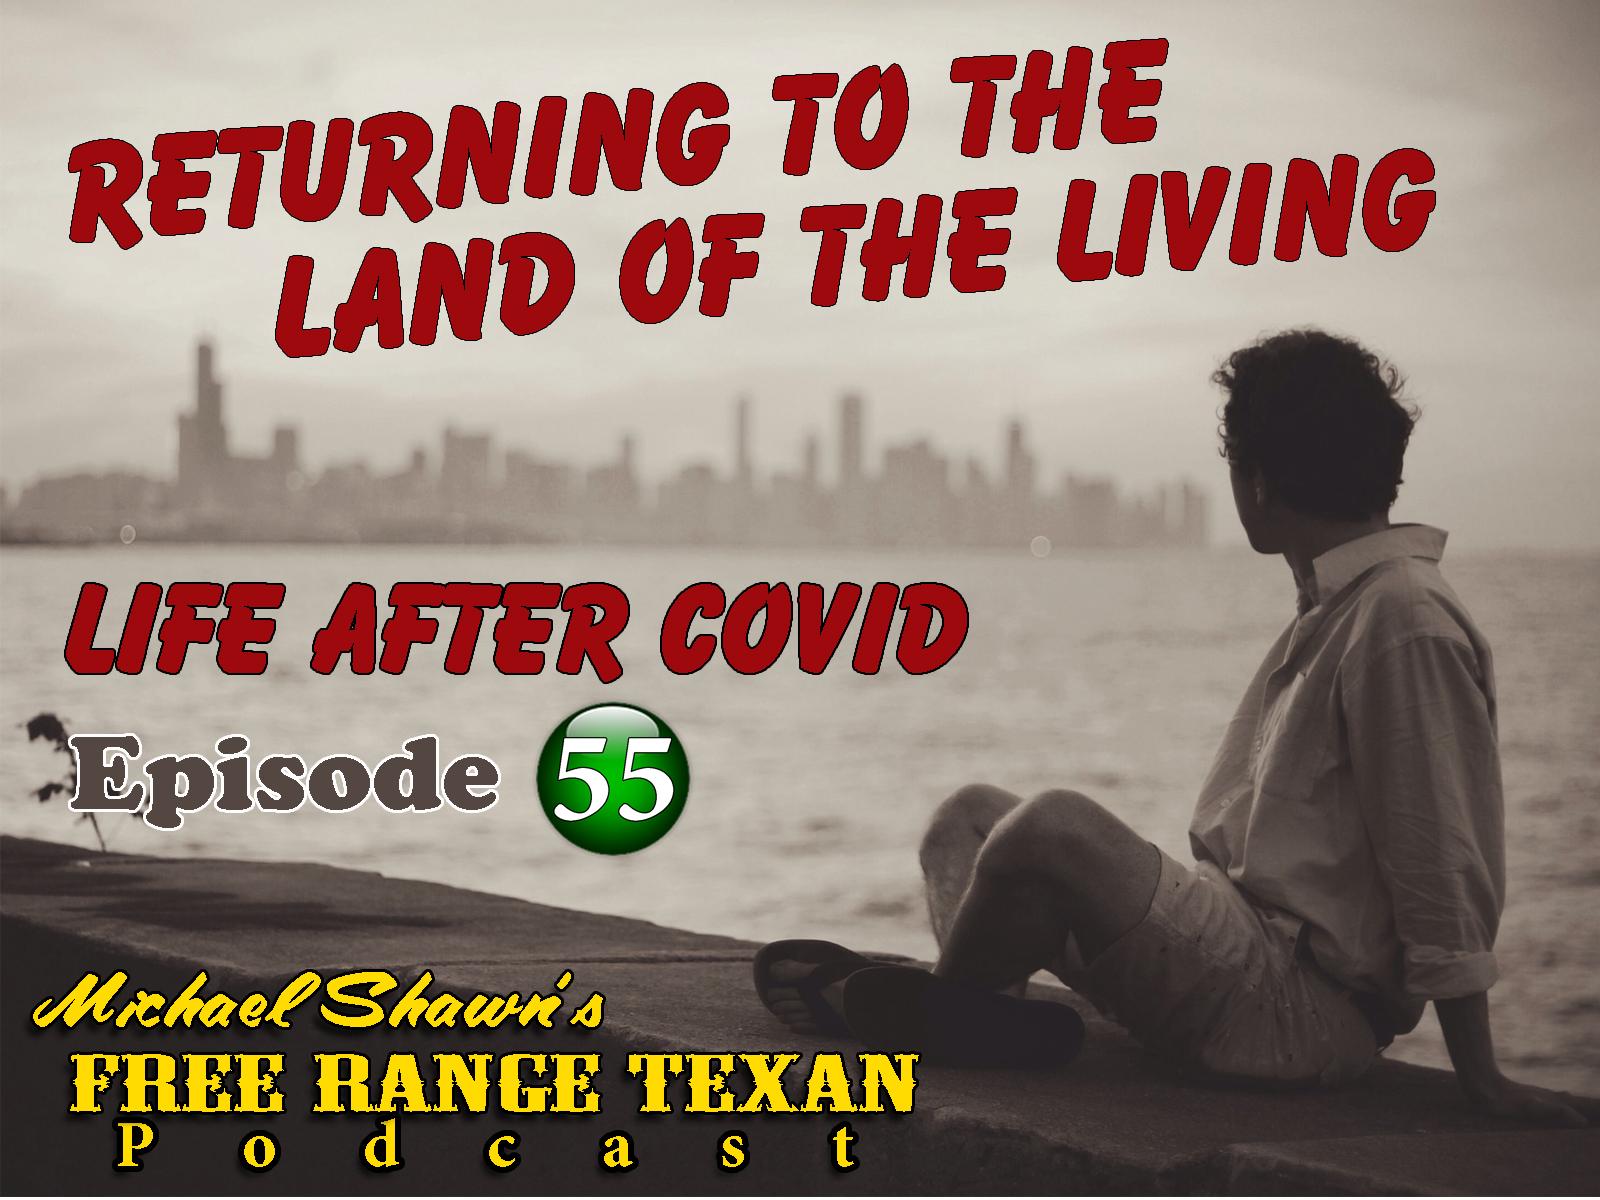 Free Range Texan Episode 55 I'm Back